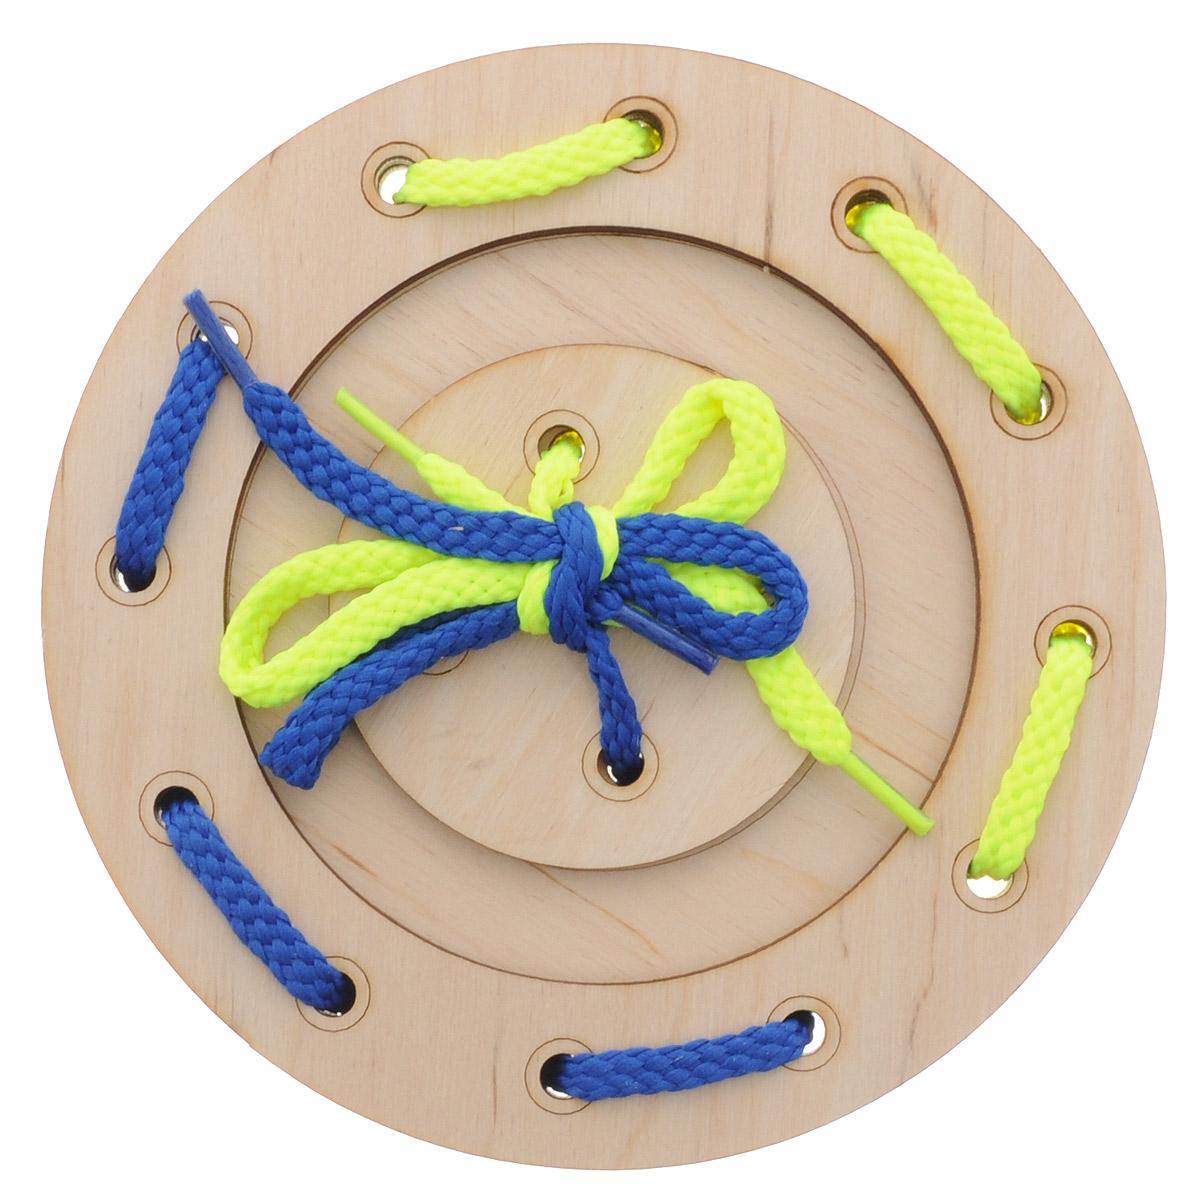 Мастер Вуд Игра-шнуровка Пуговичка цвет синий желтый мастер вуд игра шнуровка пуговичка цвет синий желтый